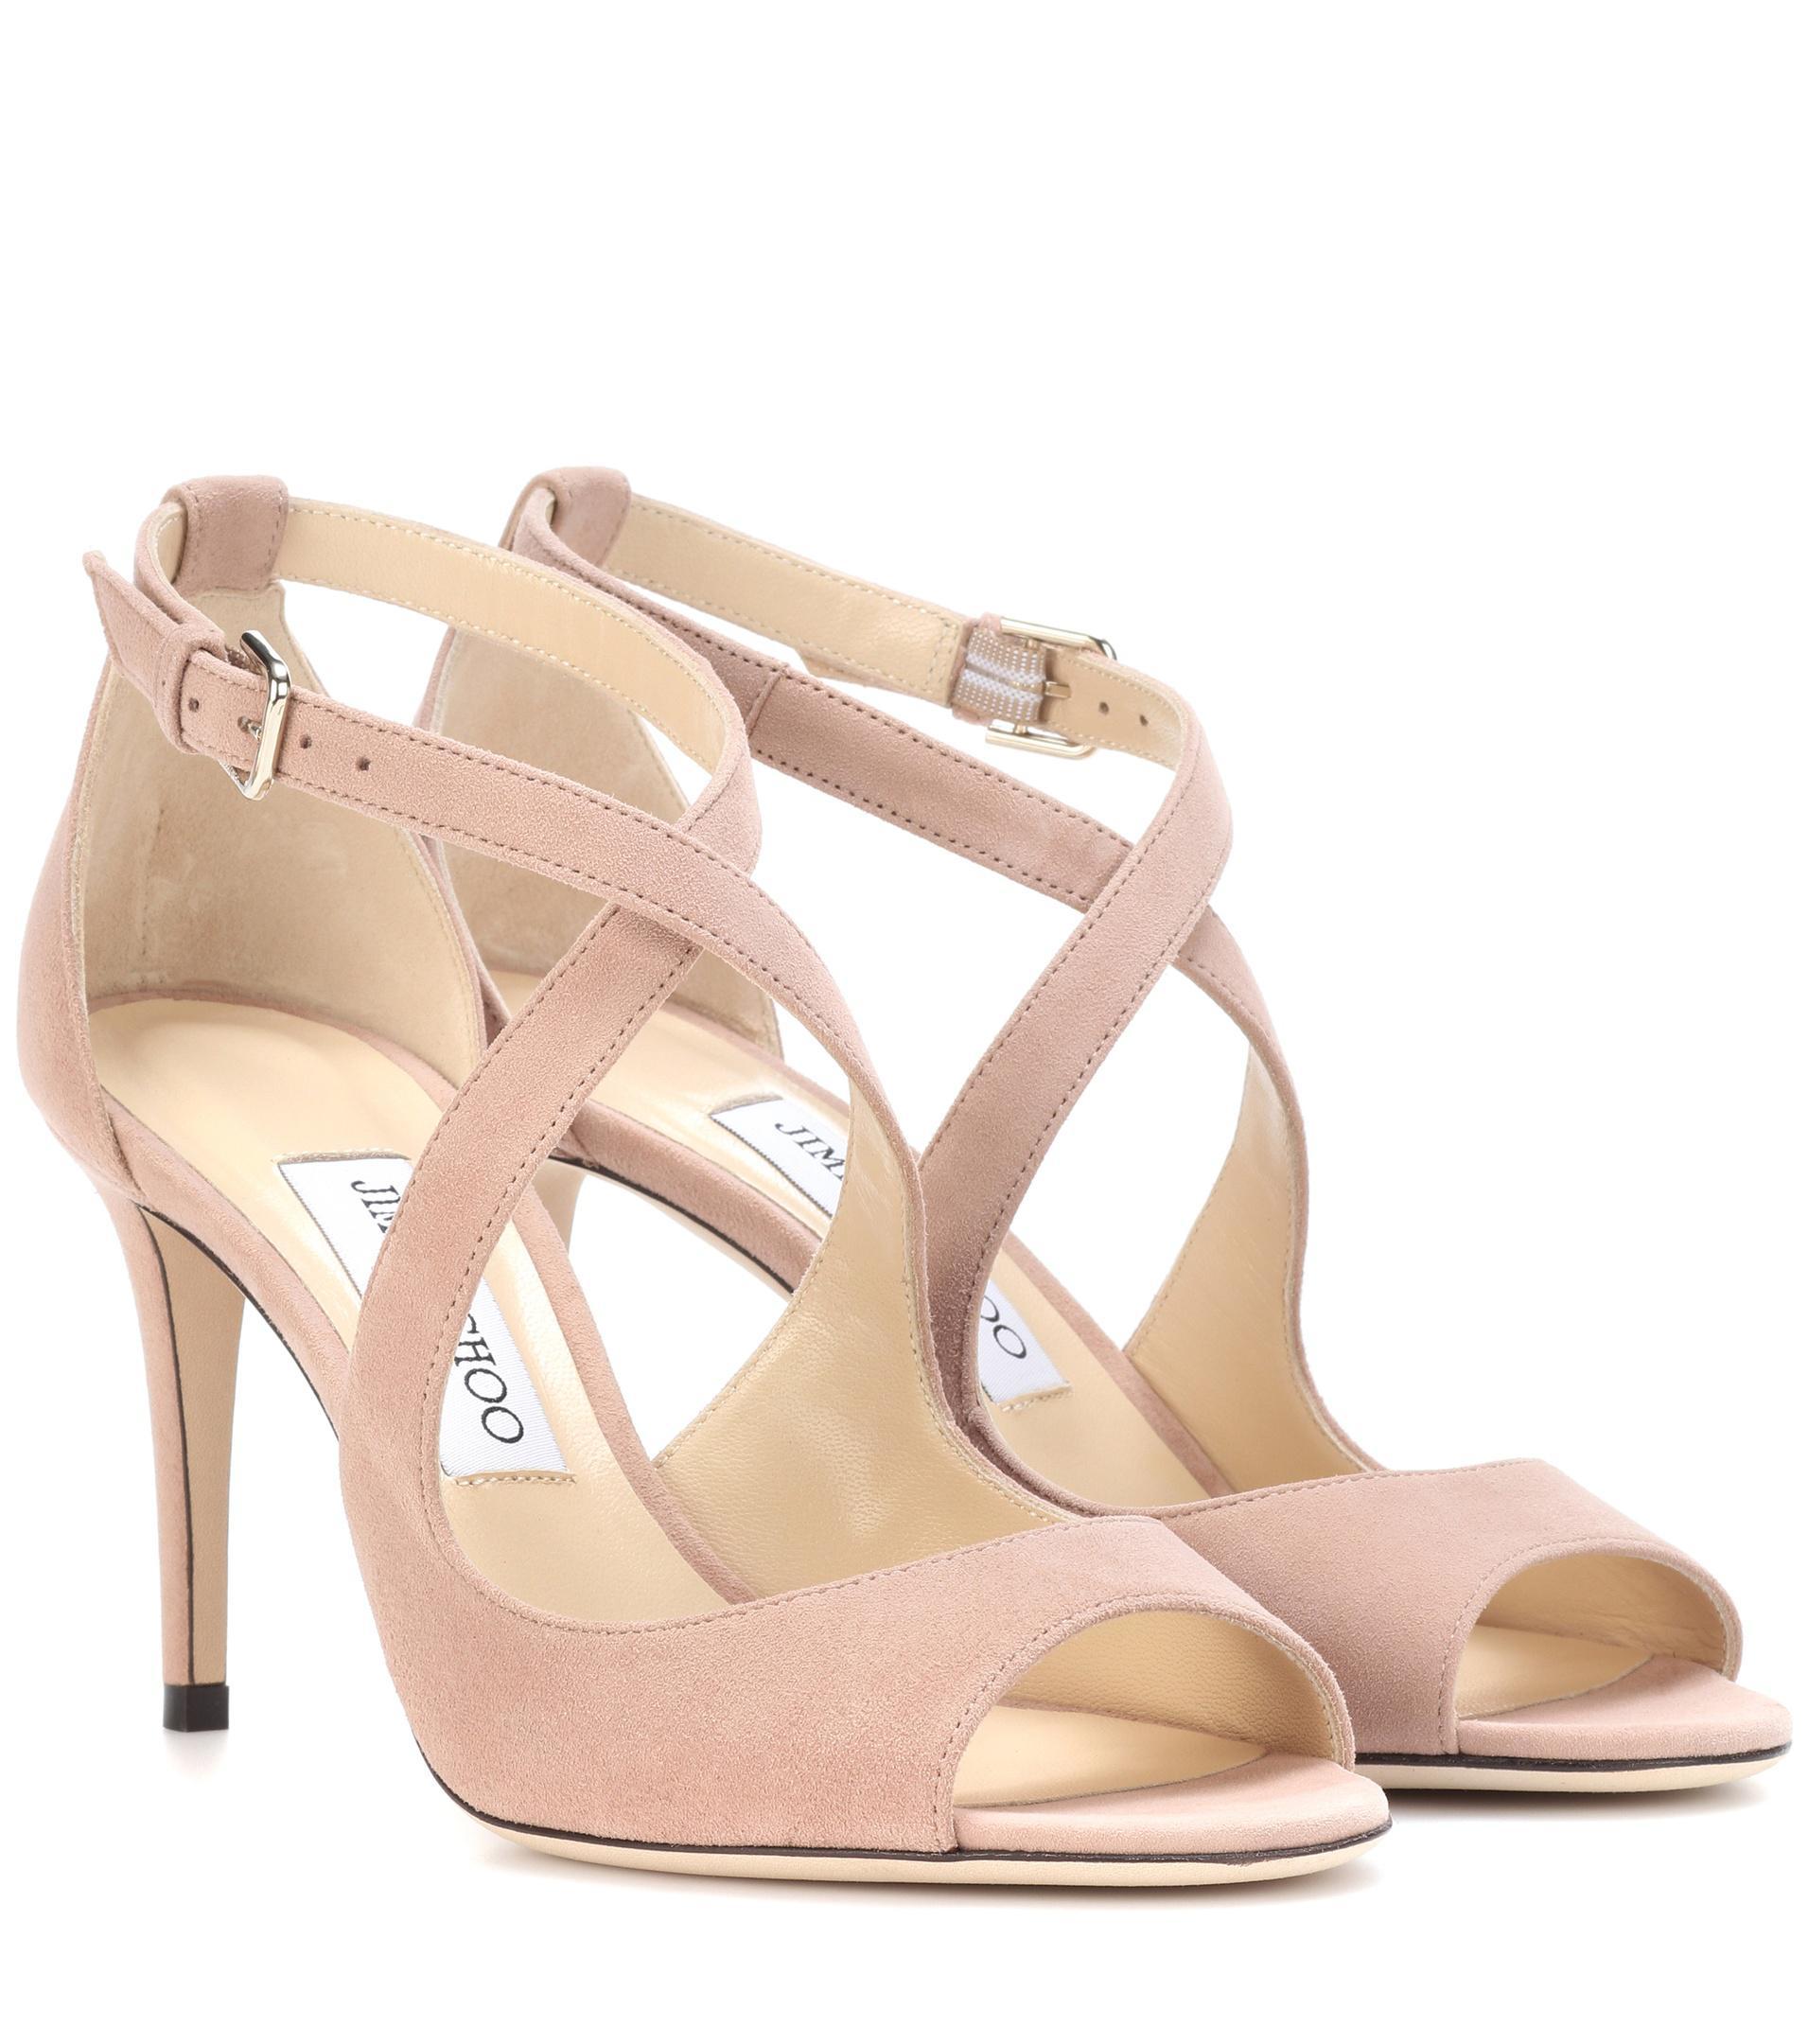 efb13056f553 ... new zealand jimmy choo. womens pink emily 85 suede sandals ee4b6 e4f20